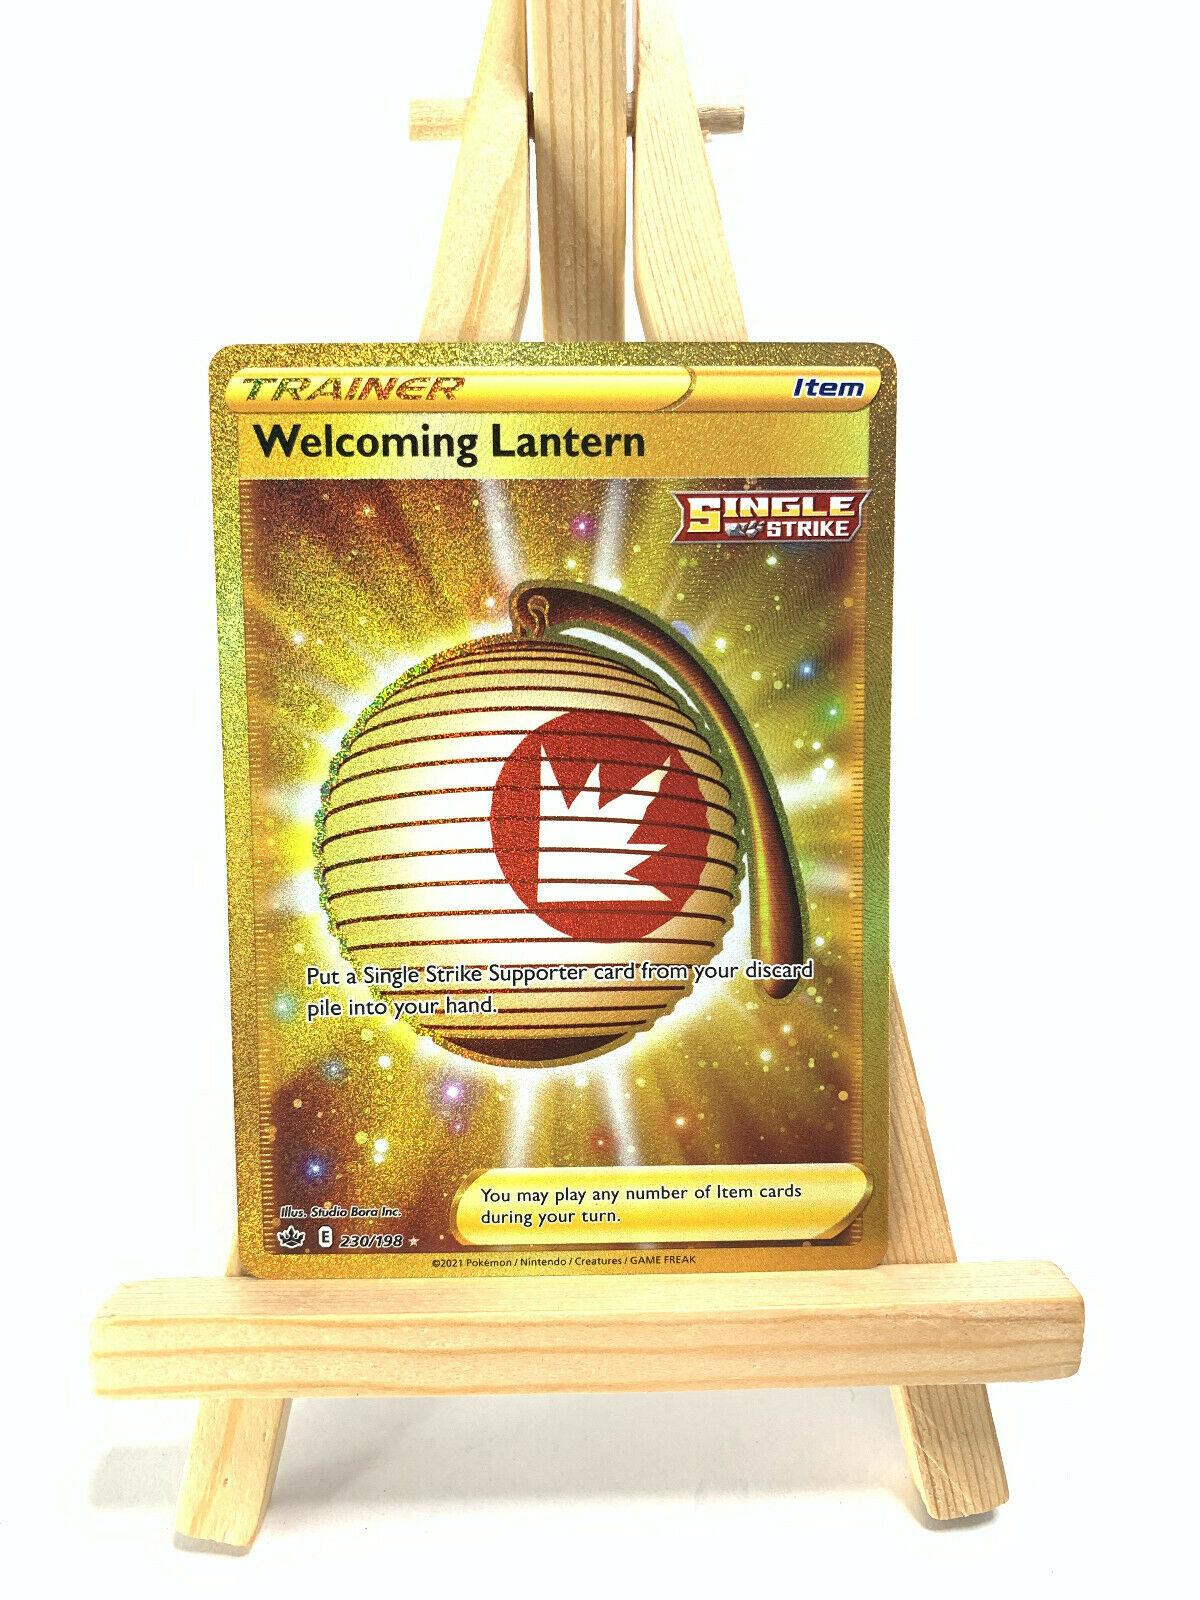 Pokemon - WELCOMING LANTERN 230/198 - Chilling Reign - Secret Rare - NM